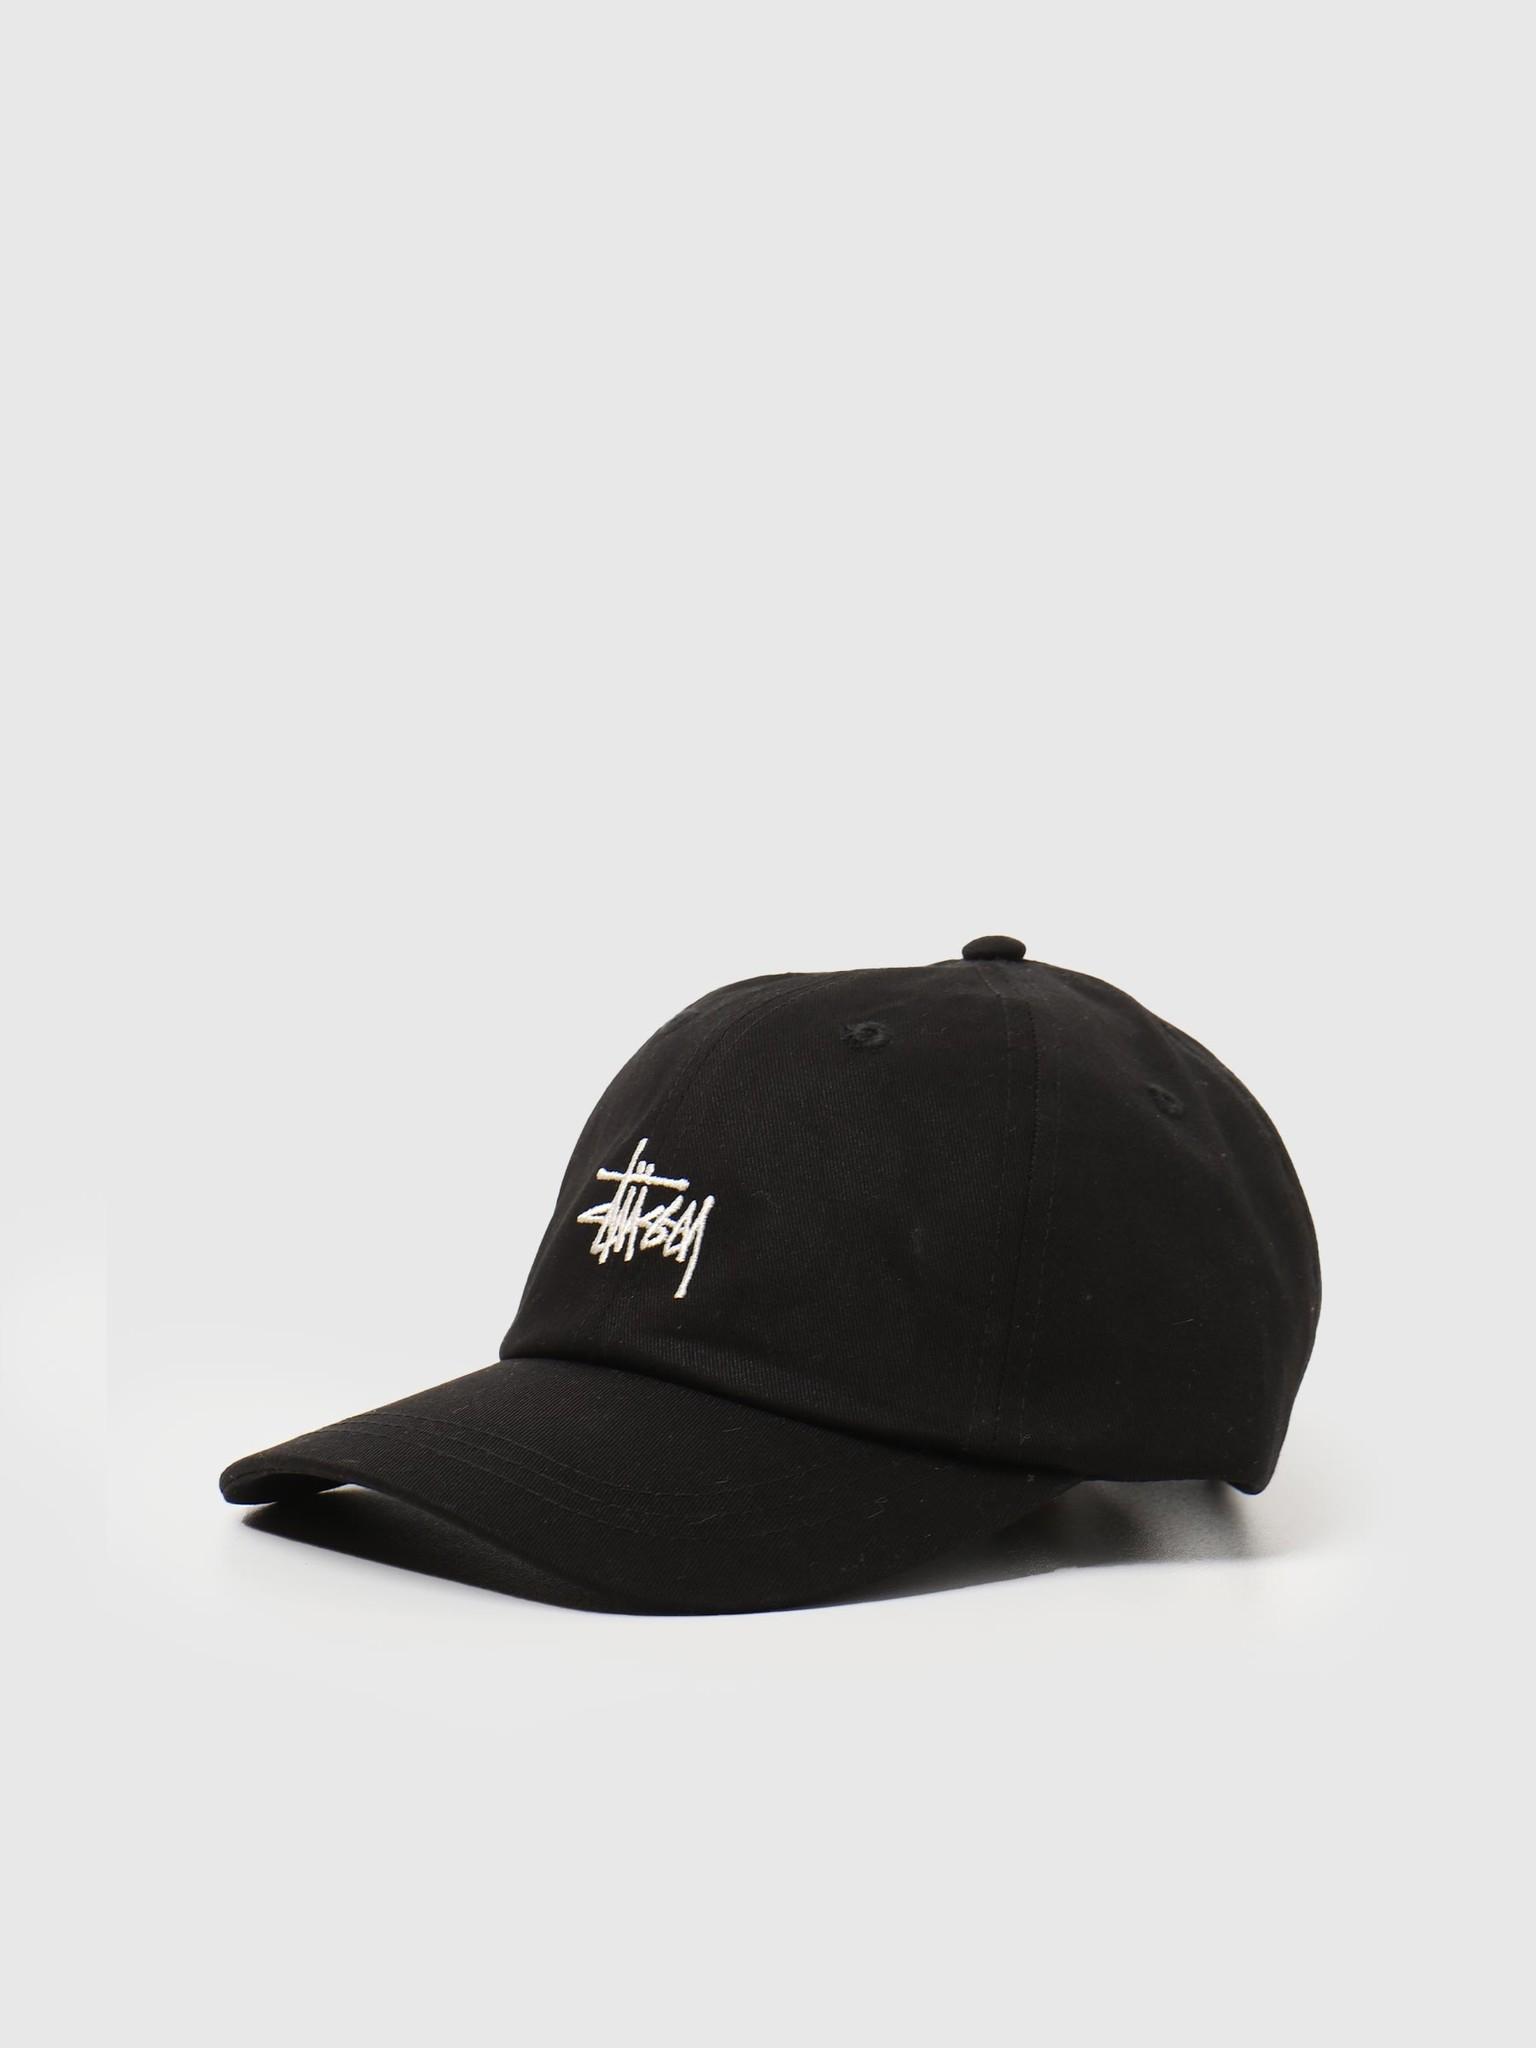 Stussy Stussy Stock Low Pro Cap Black 131982-0001